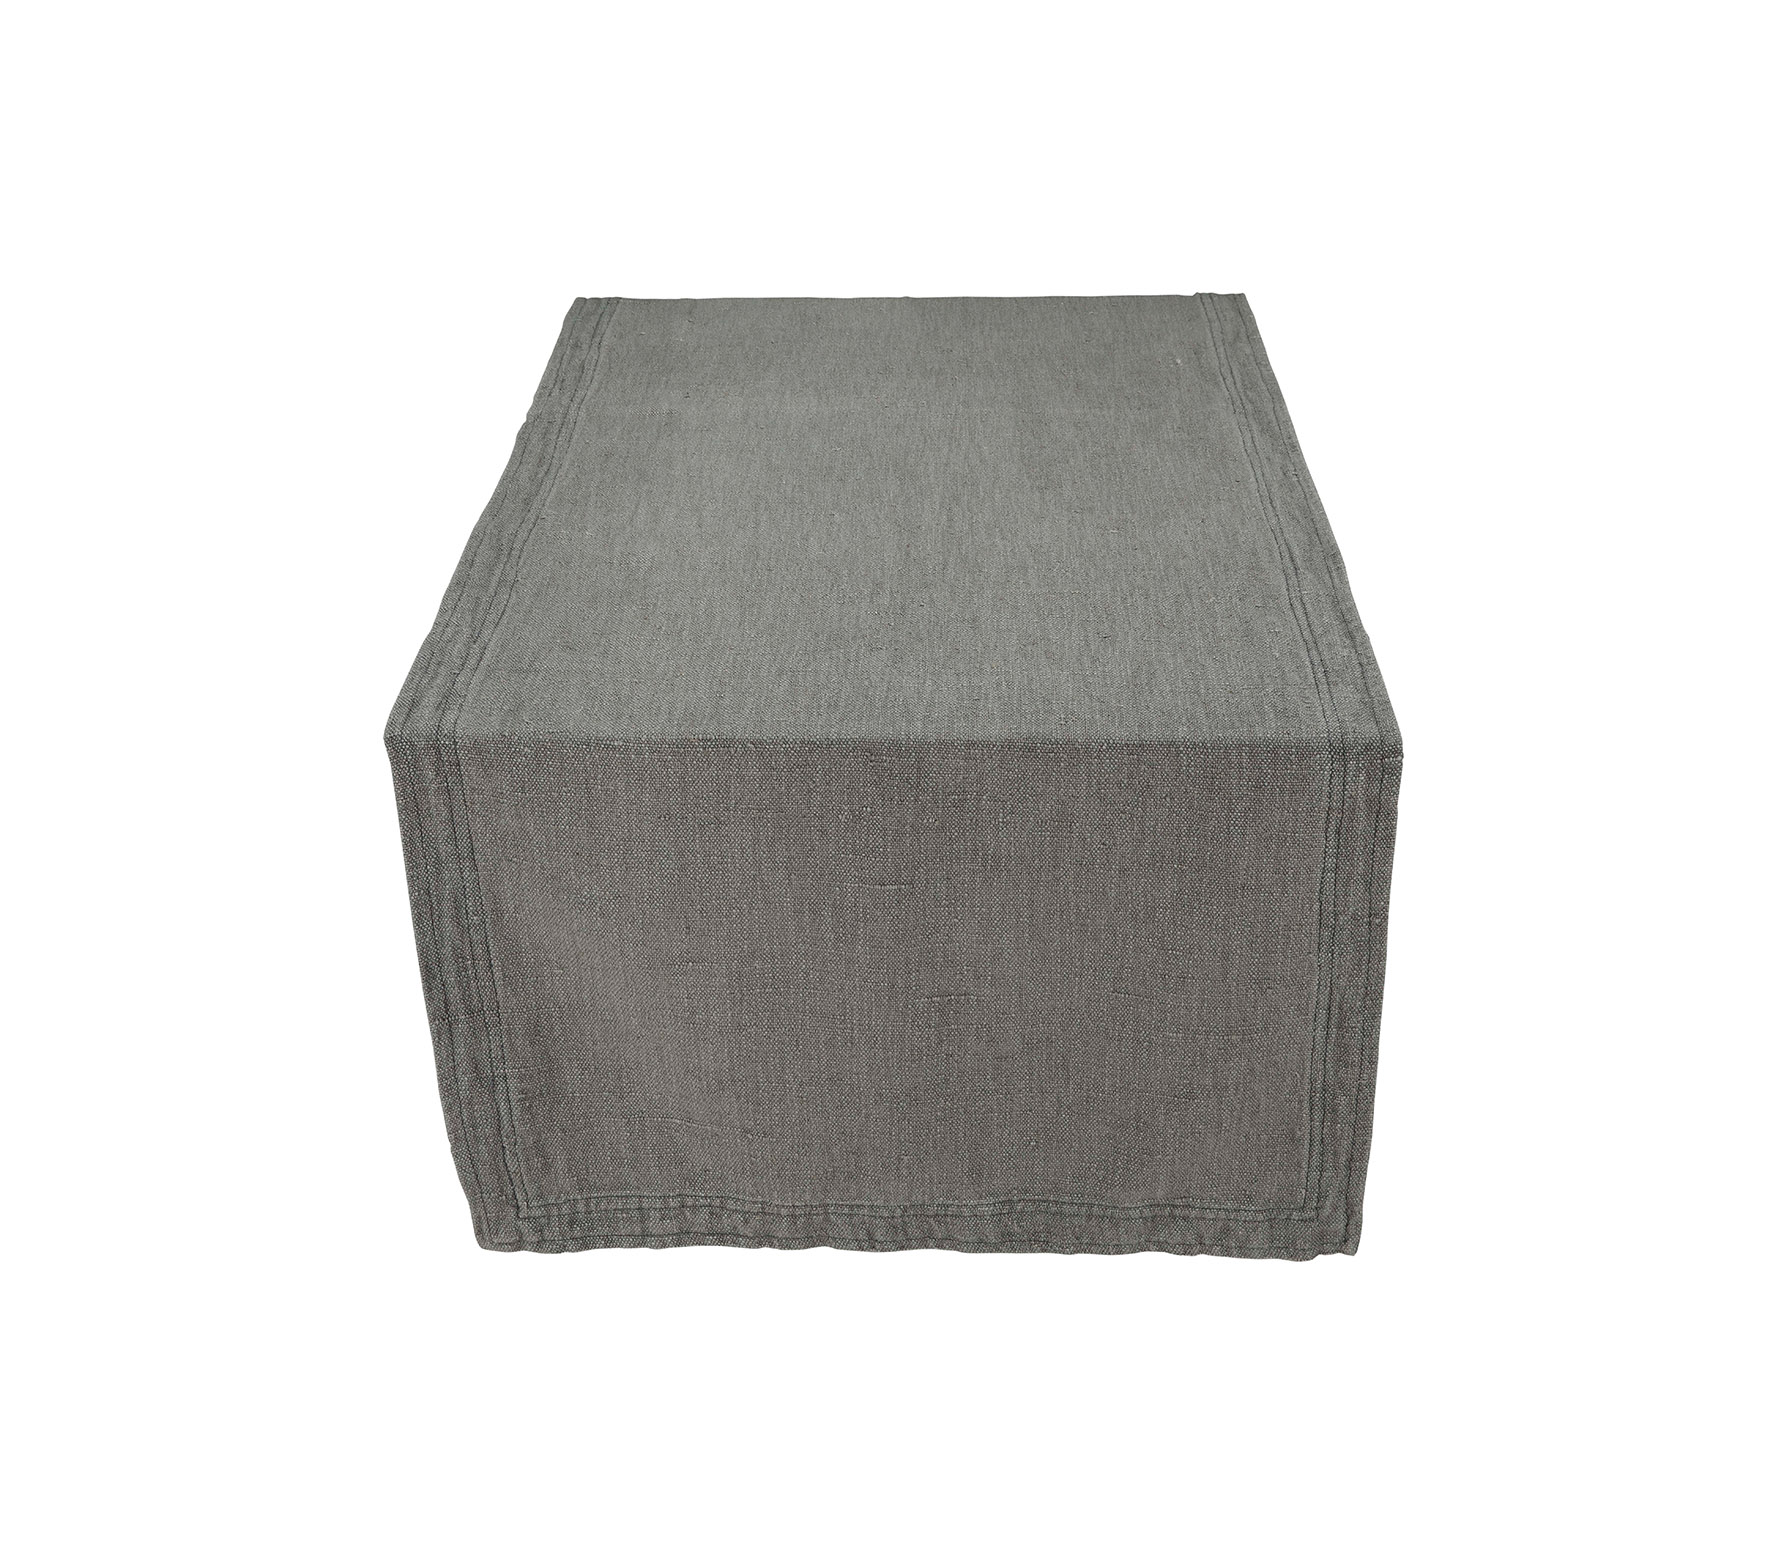 vtwonen tafelloper katoen linnen grijs vrijstaand